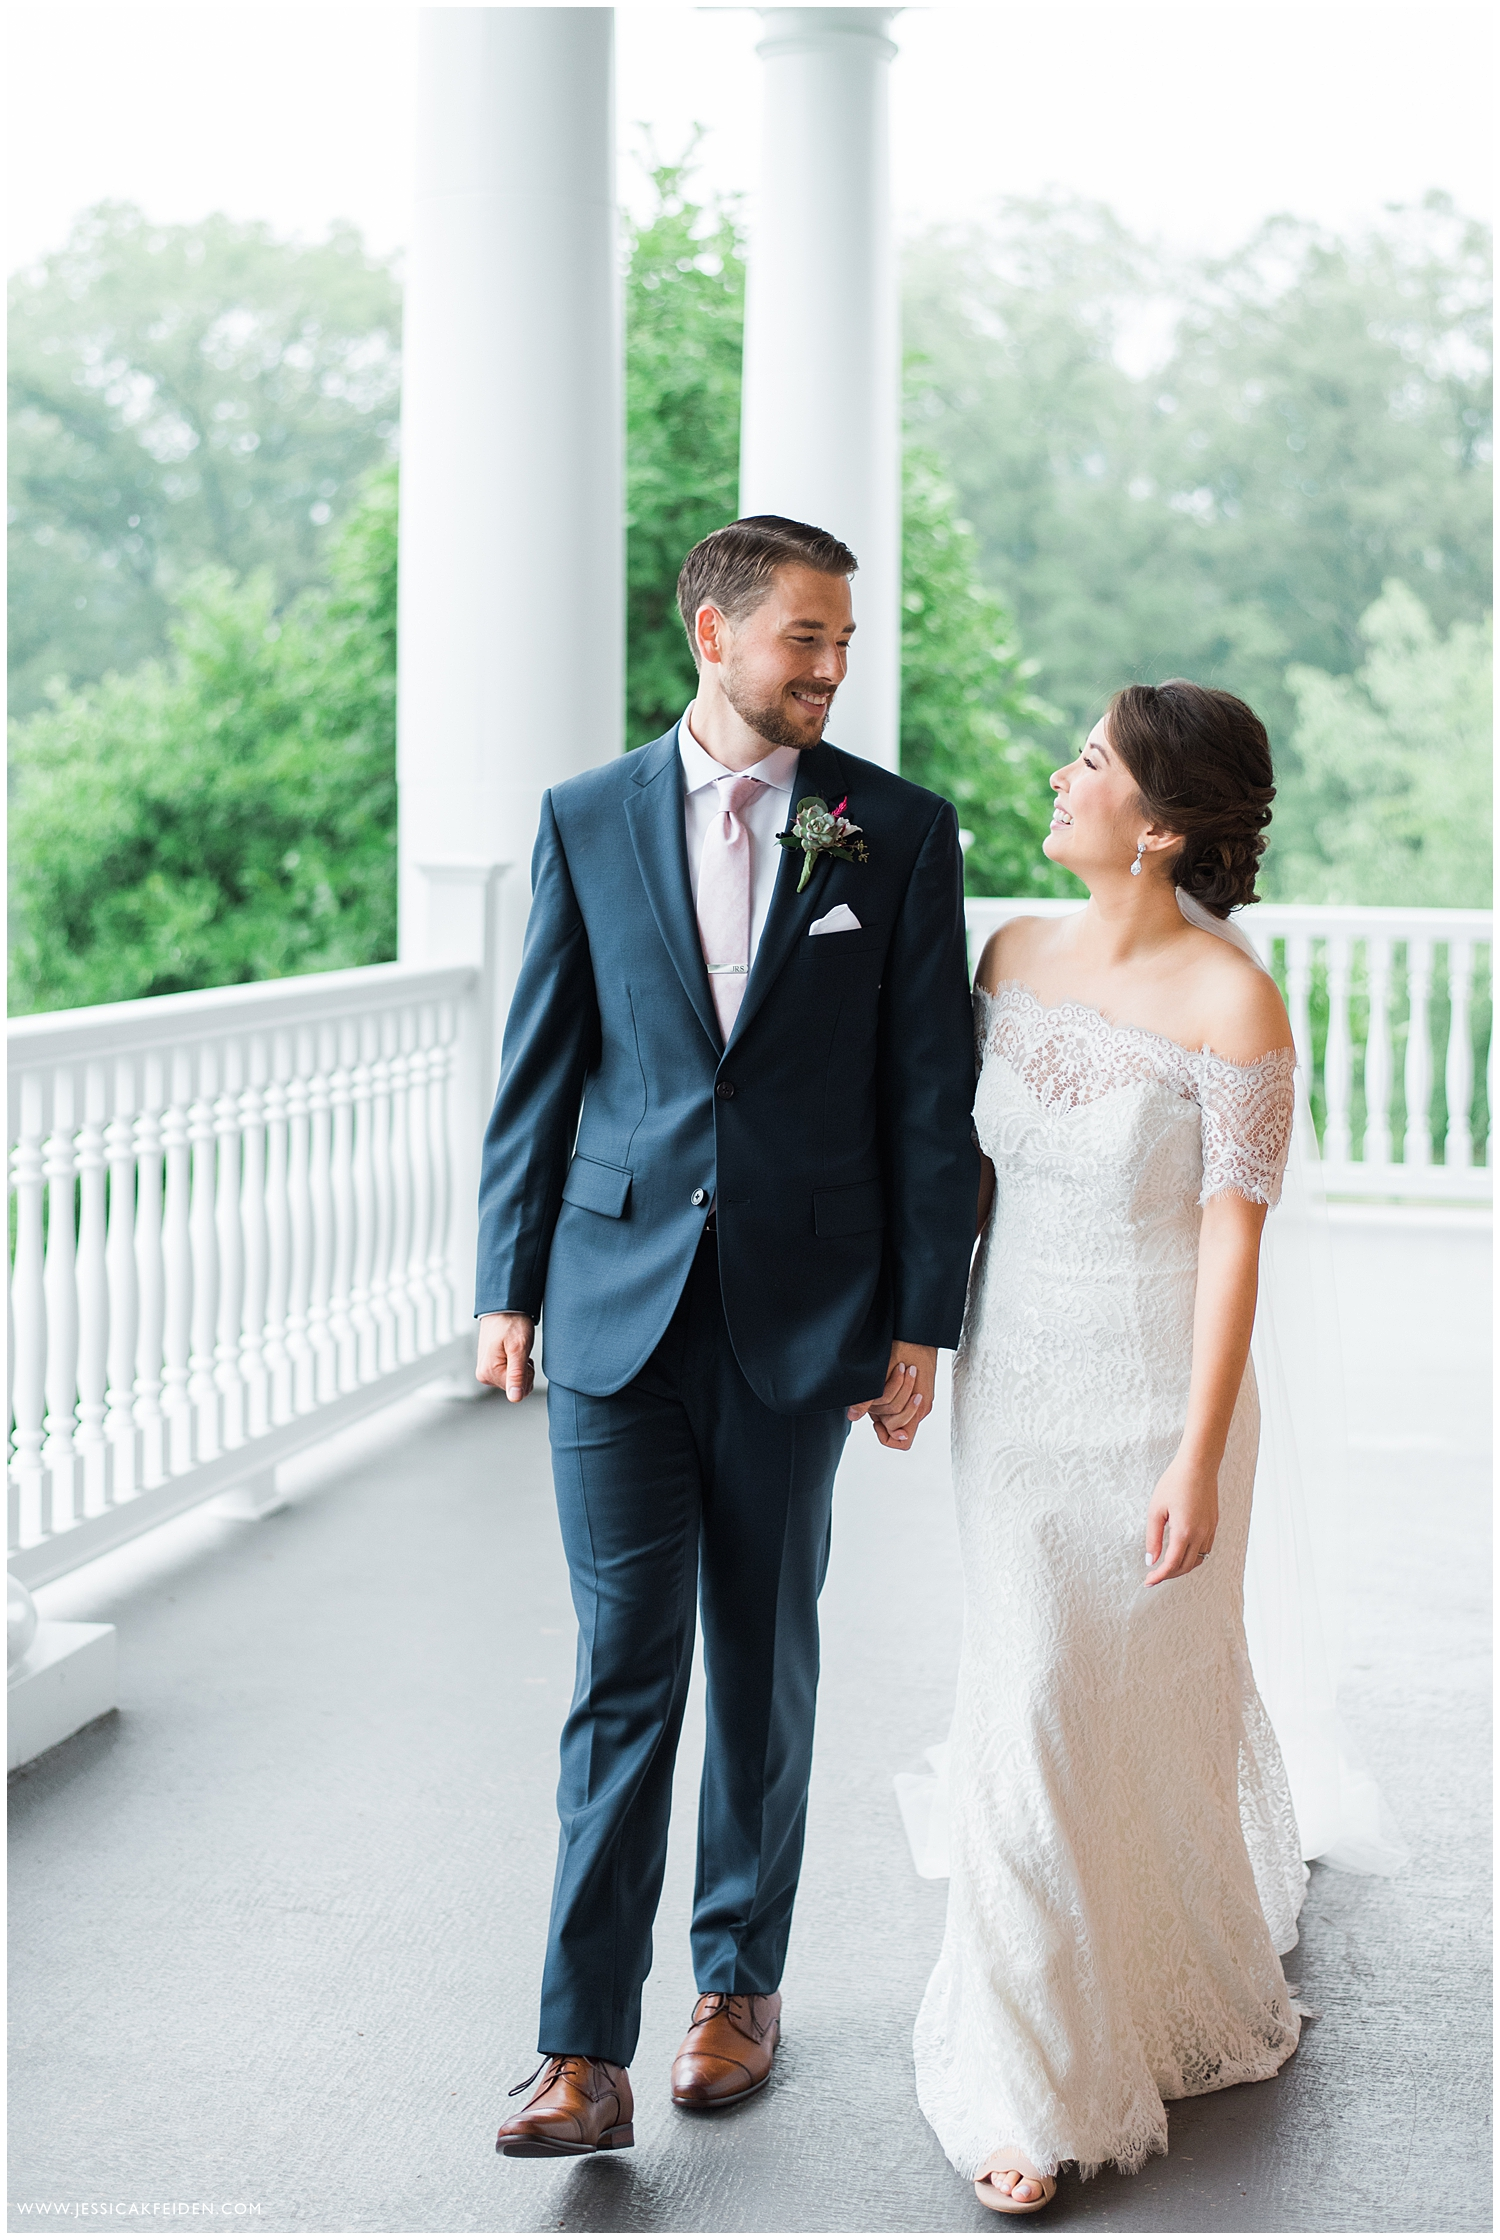 Jessica K Feiden Photography_Charter Oak Country Club Wedding_0019.jpg